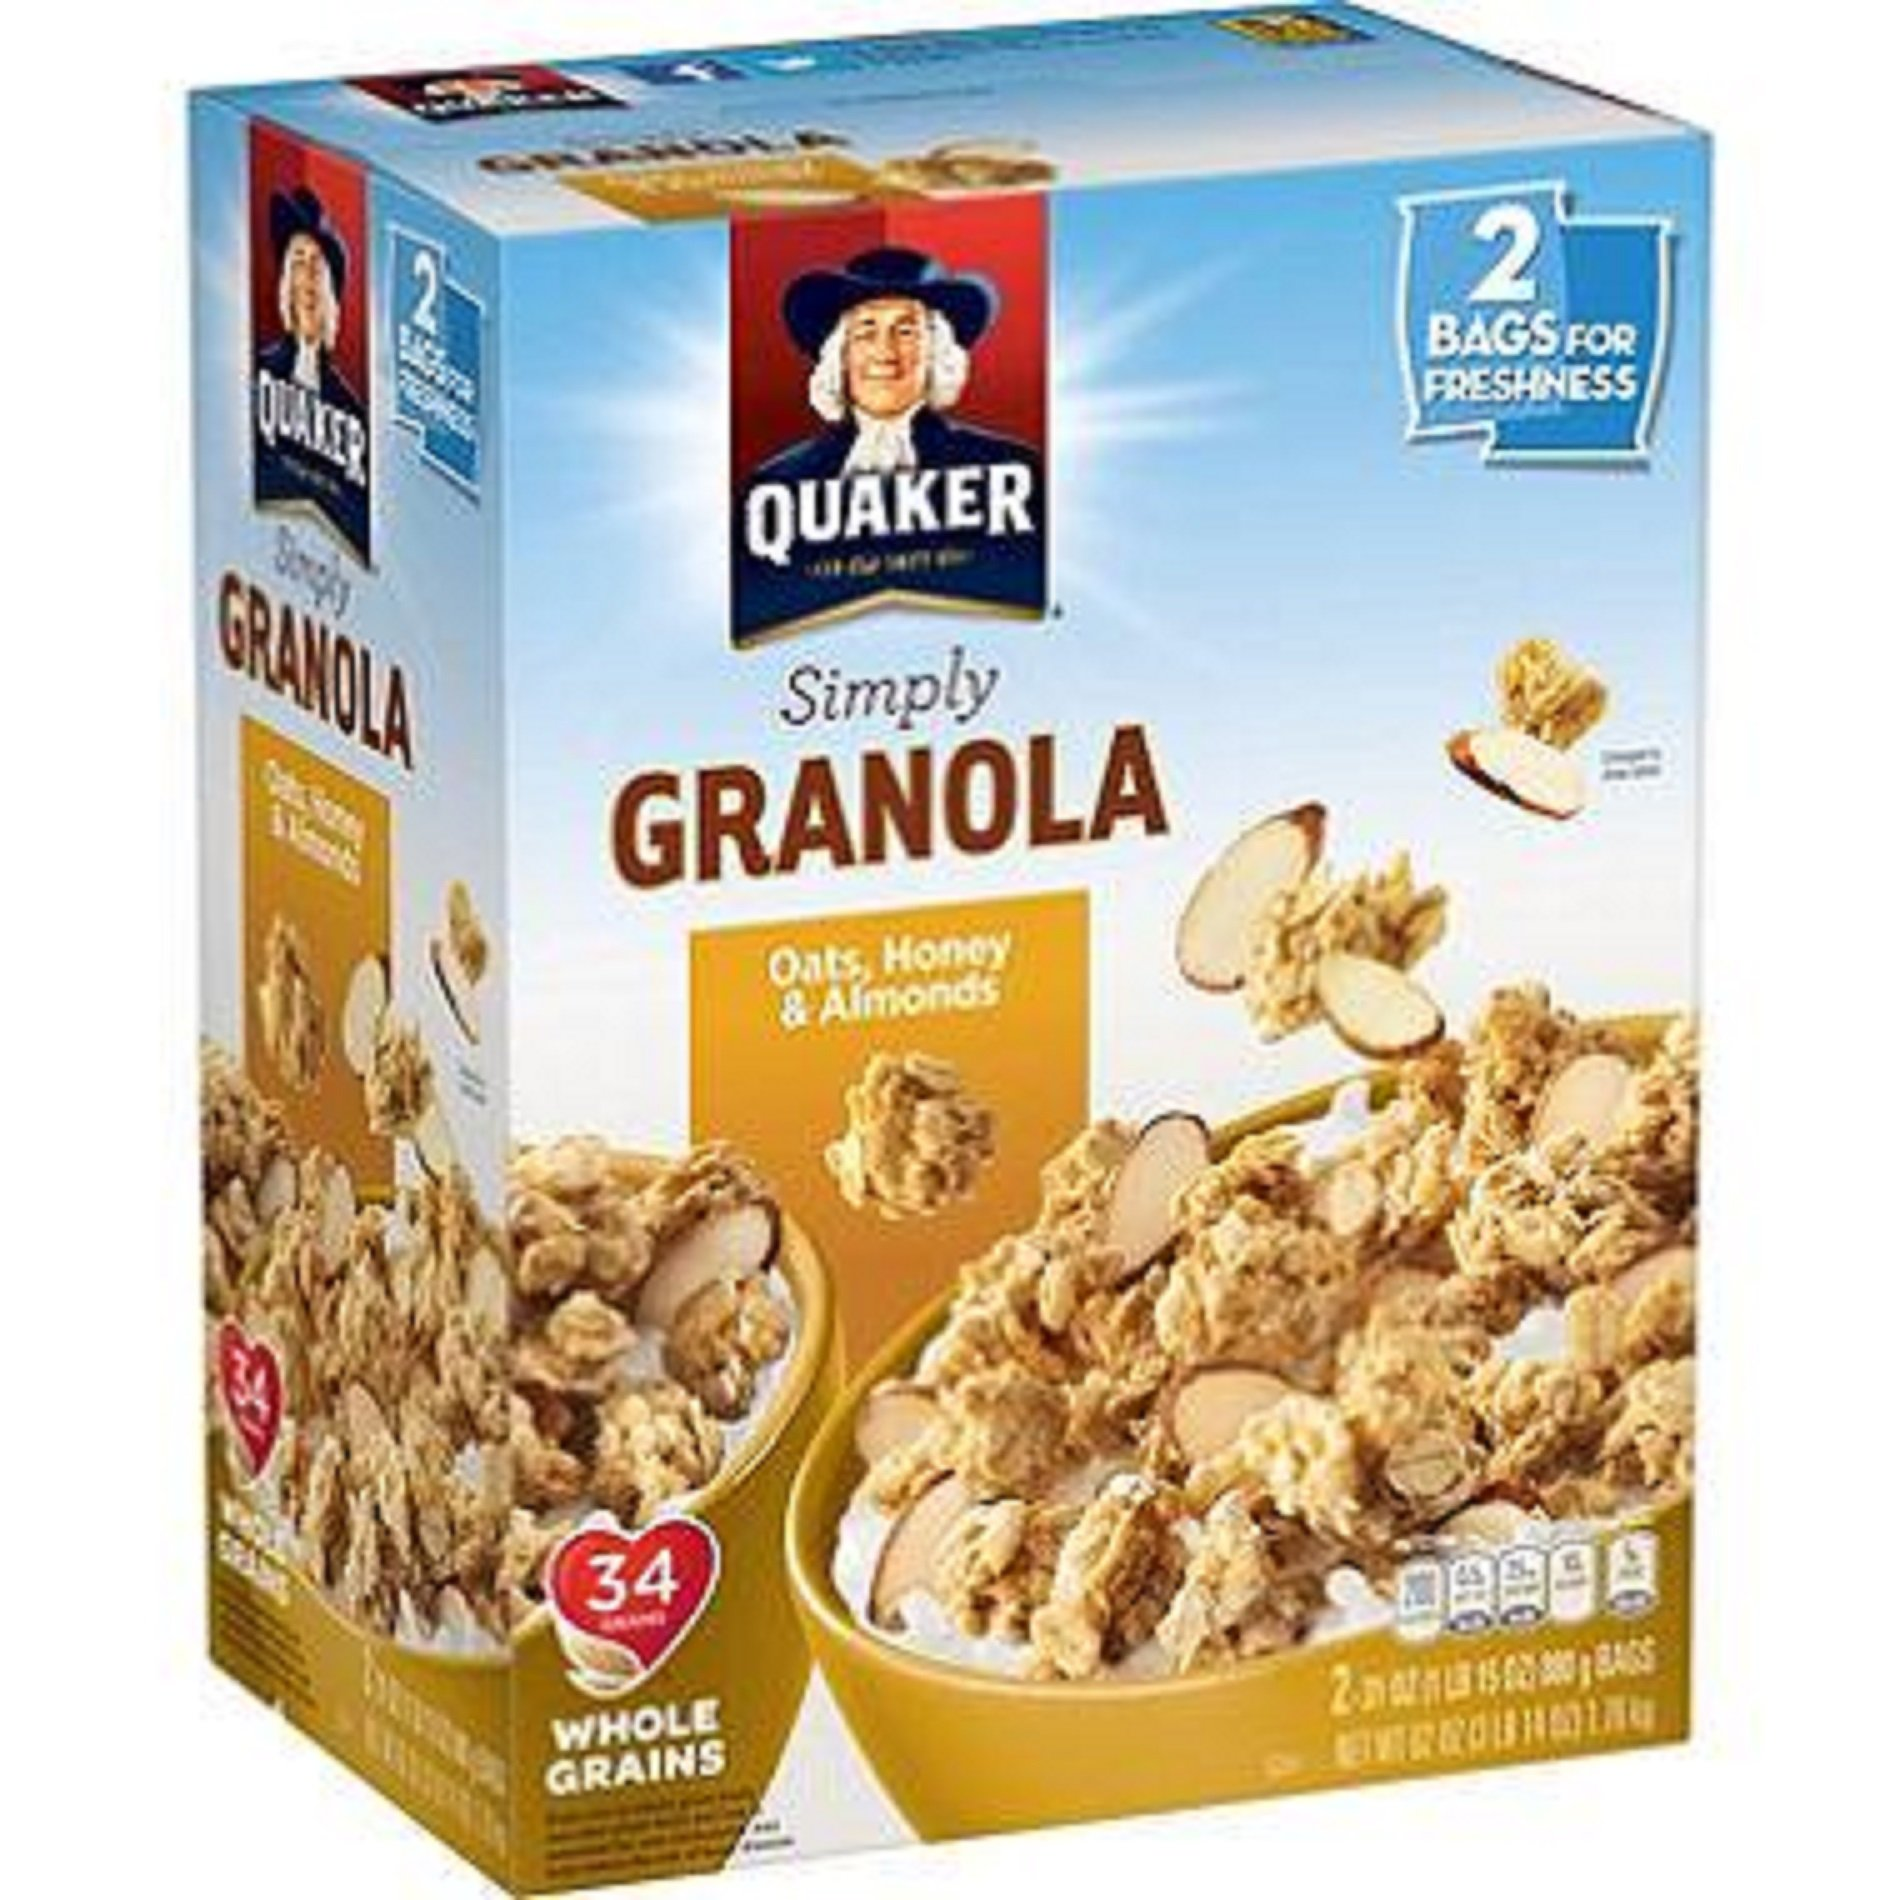 Quaker Simply Granola Oats, Honey and Almonds, 62 Ounce